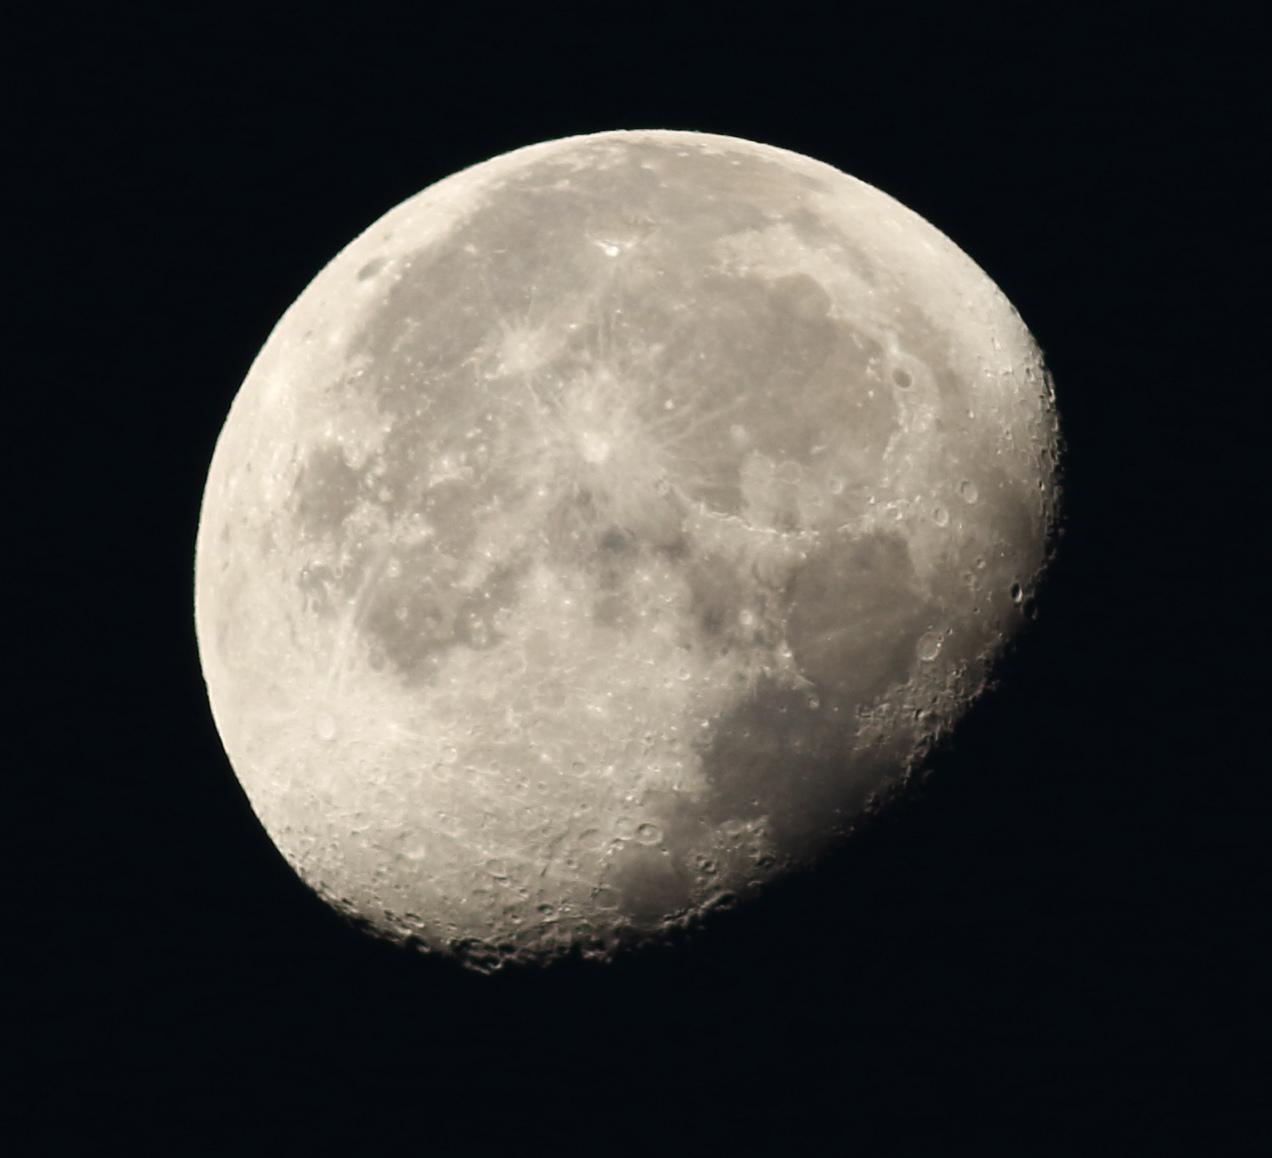 la lune, au matin du 09/10/2017 (00032080.raw/jpeg)